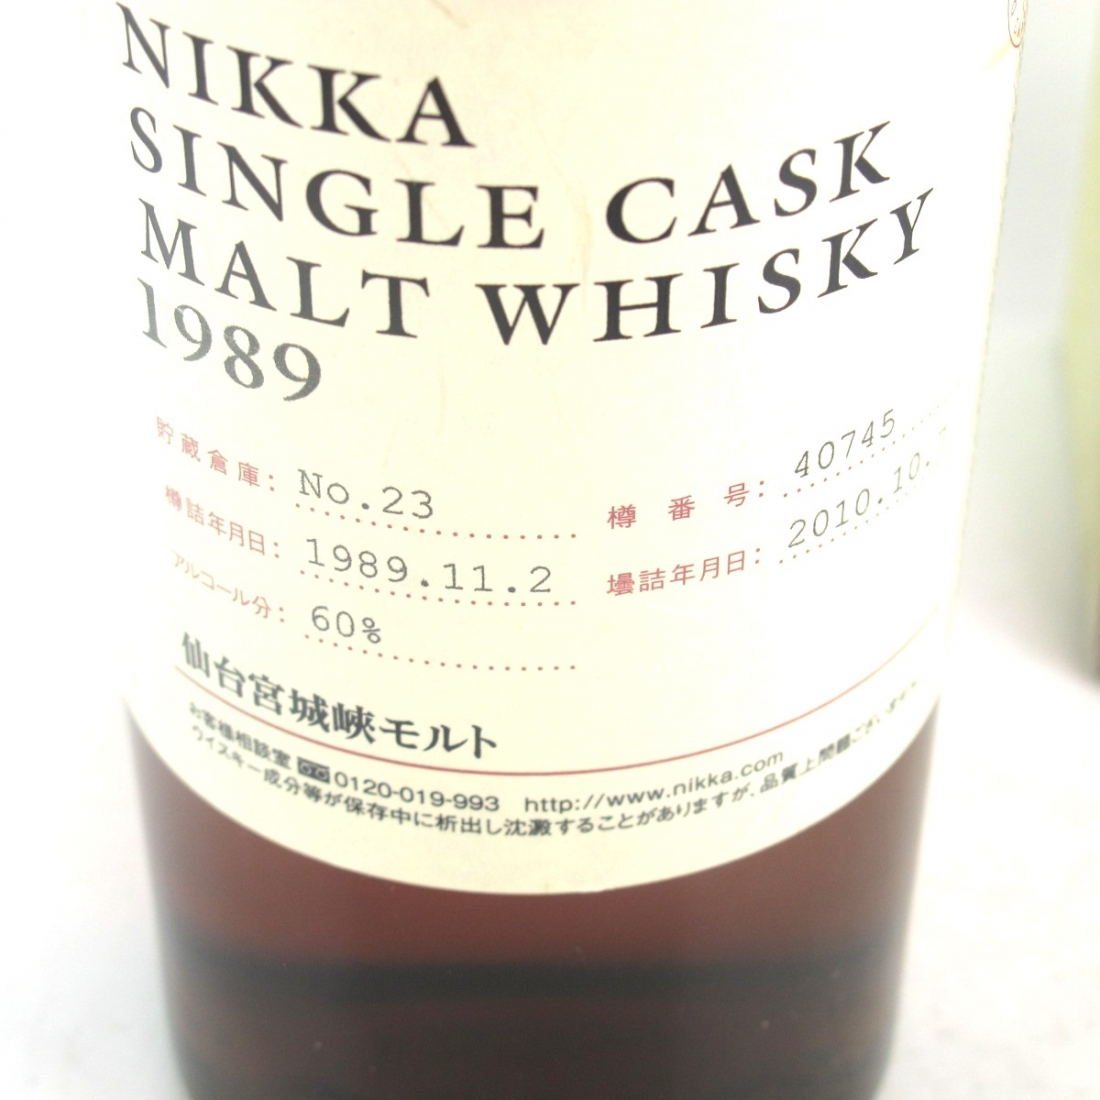 Miyagikyo 1989 Single Cask #40745